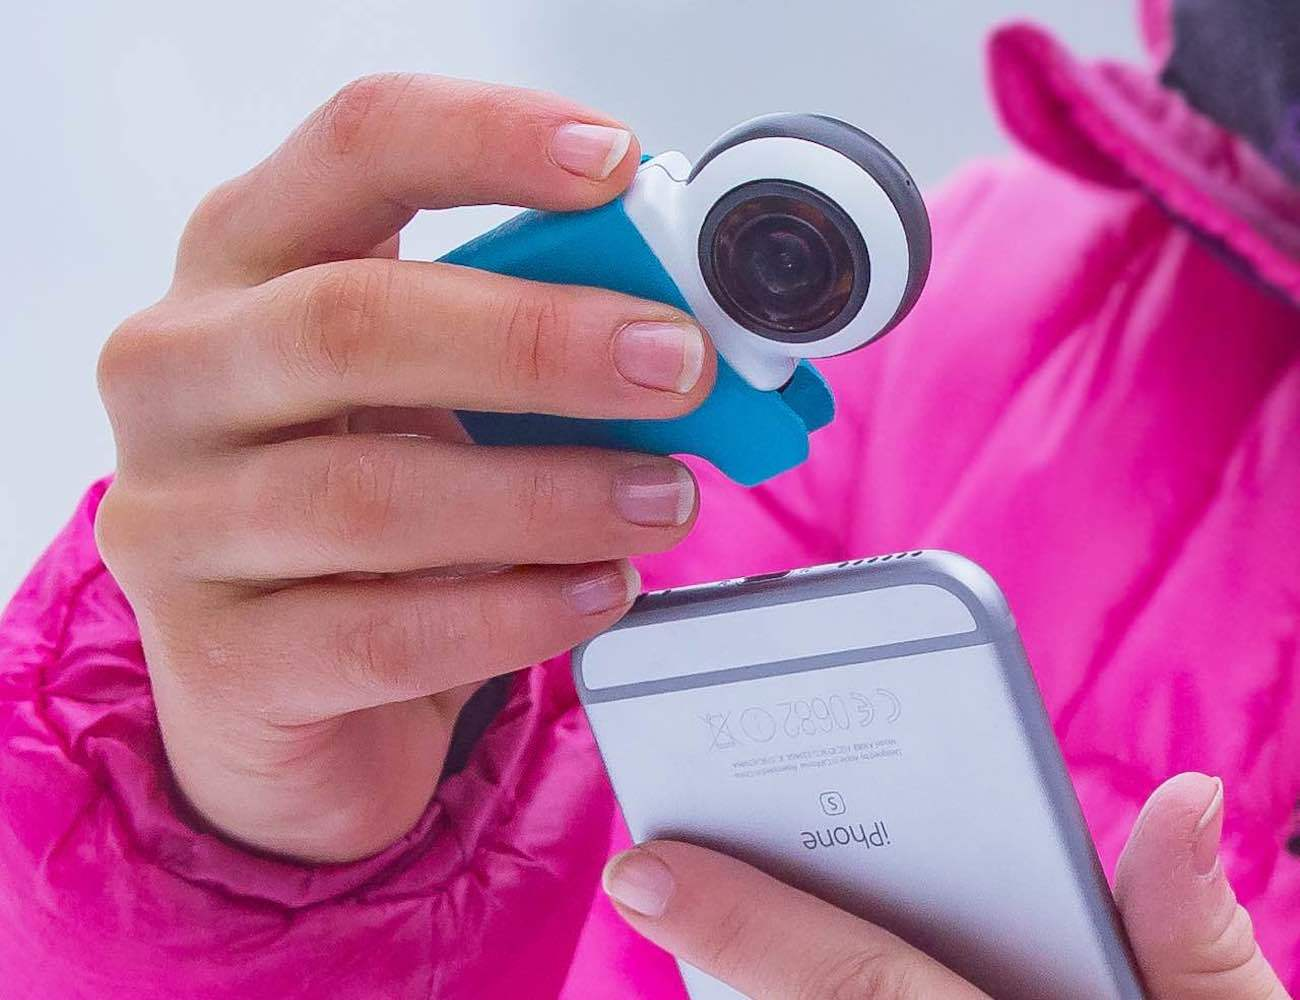 iO 360 Live-Streaming Camera